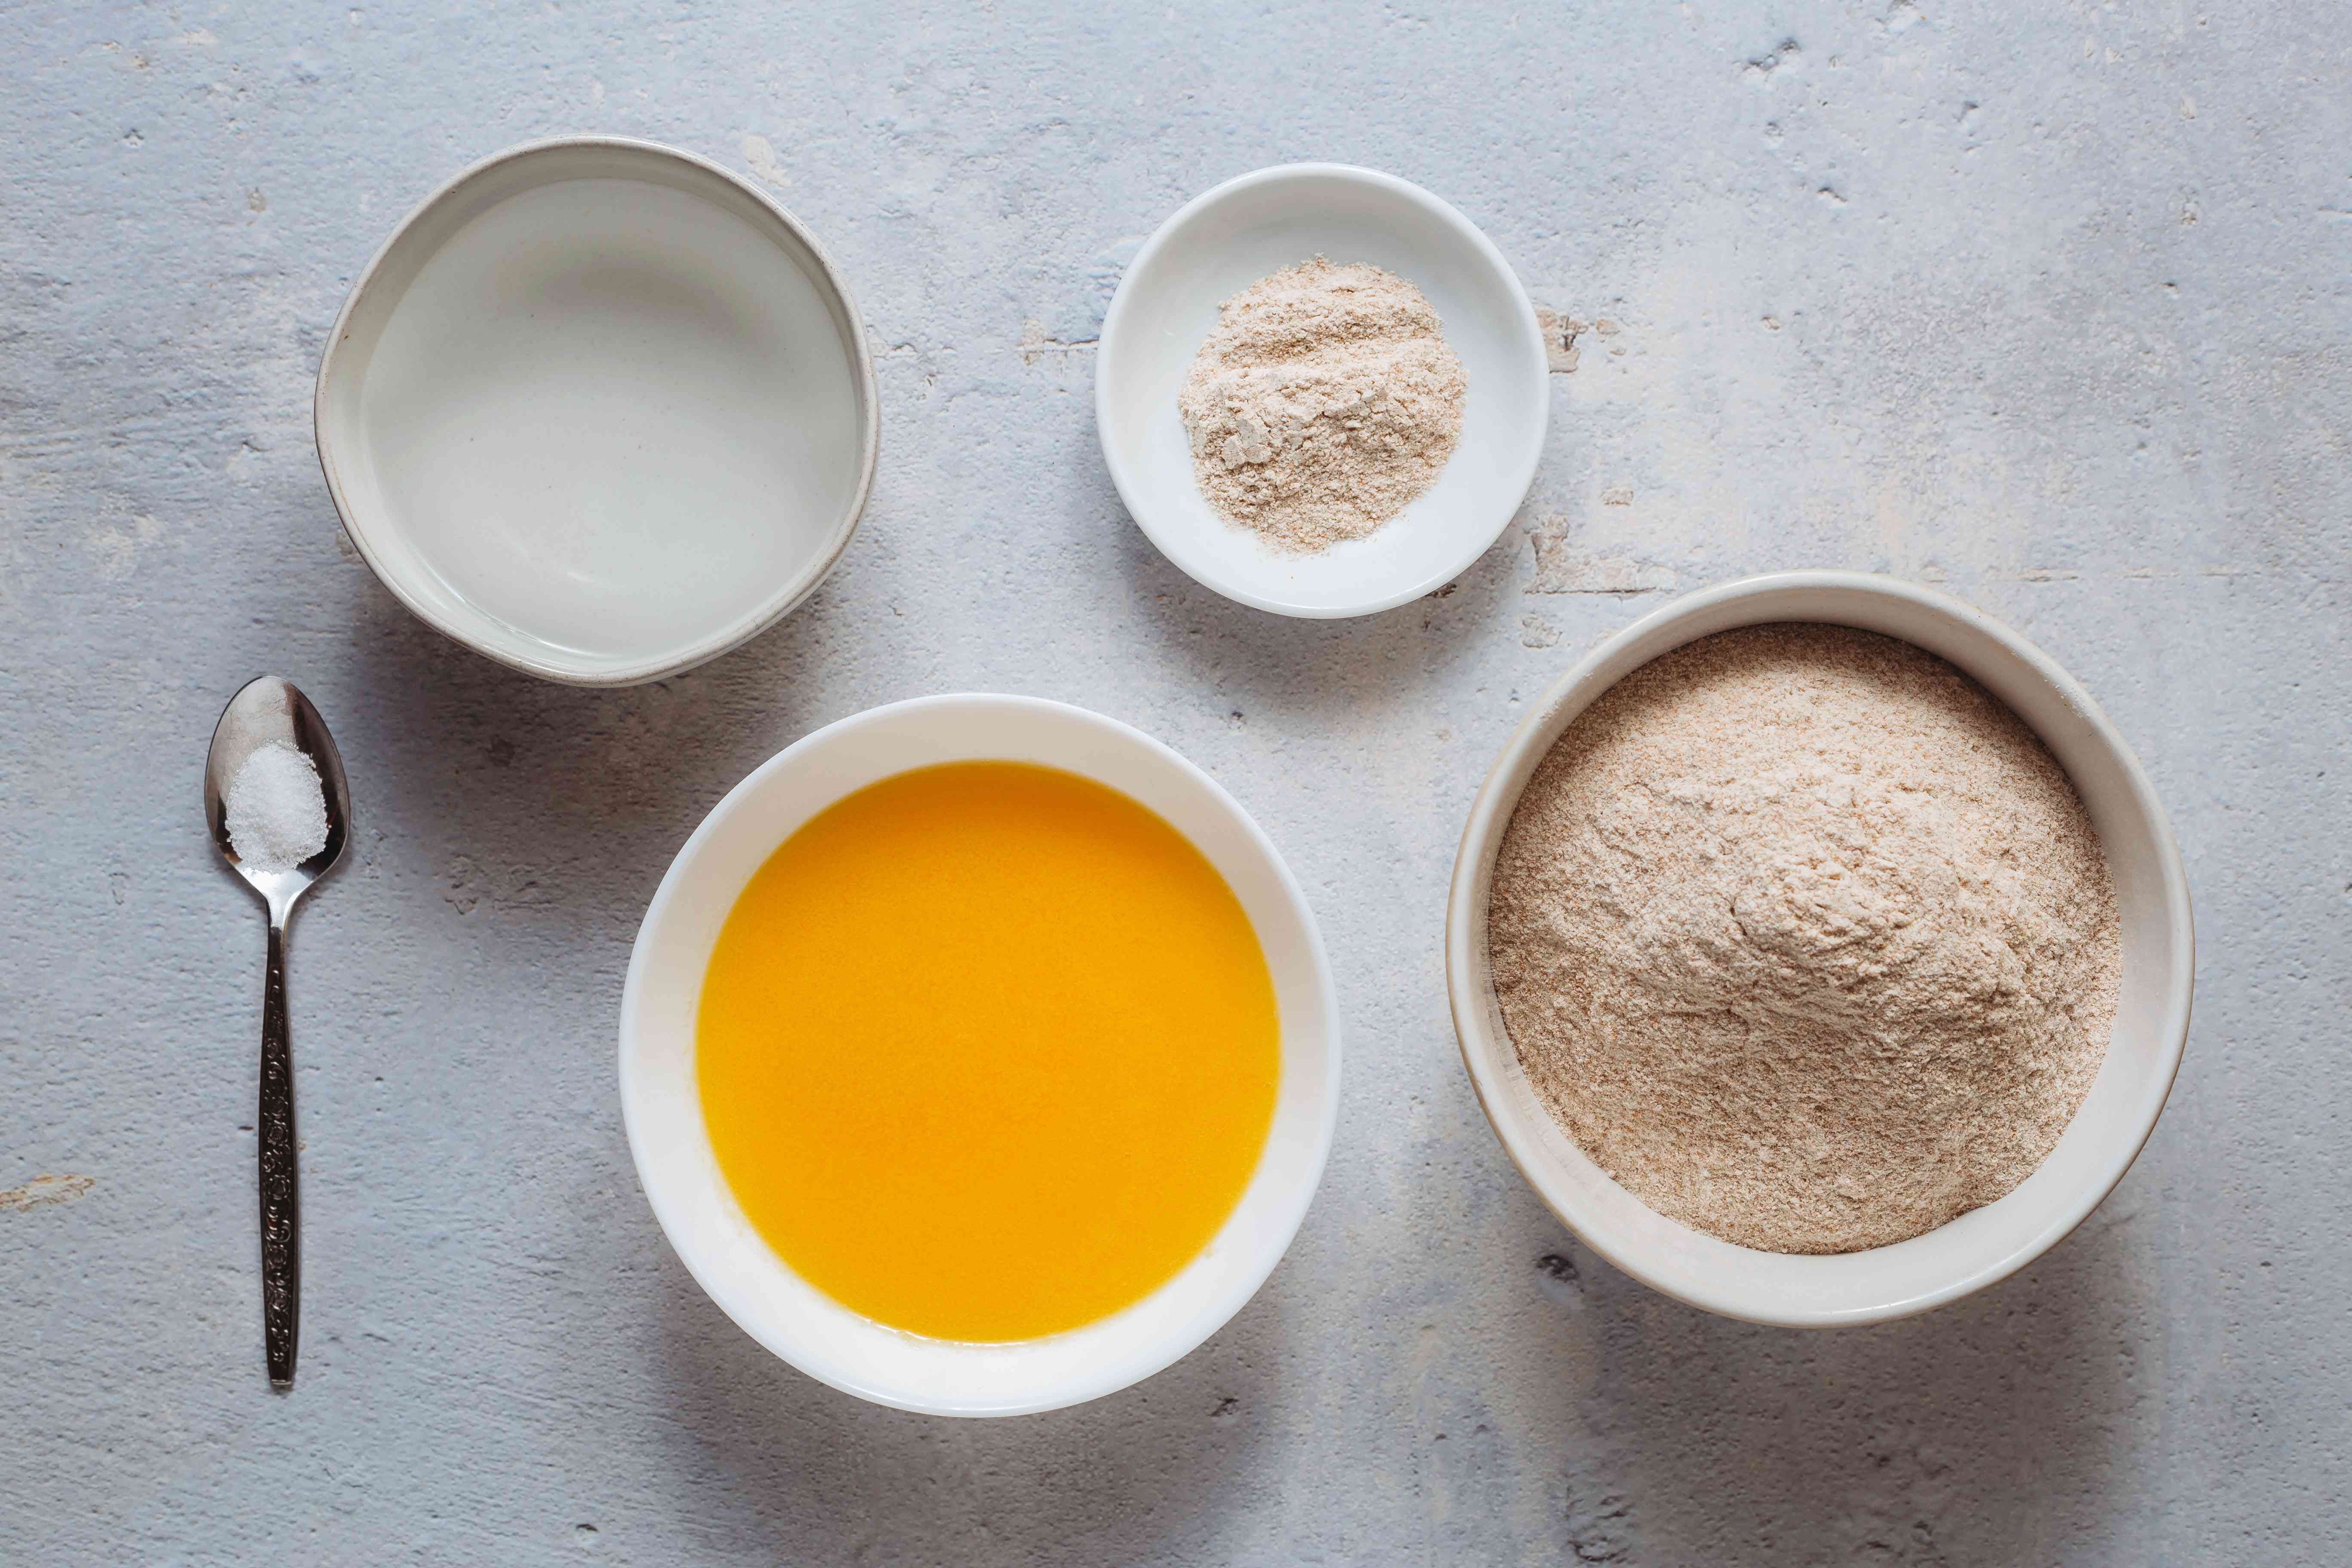 Lachcha Paratha (Layered Indian Bread) ingredients